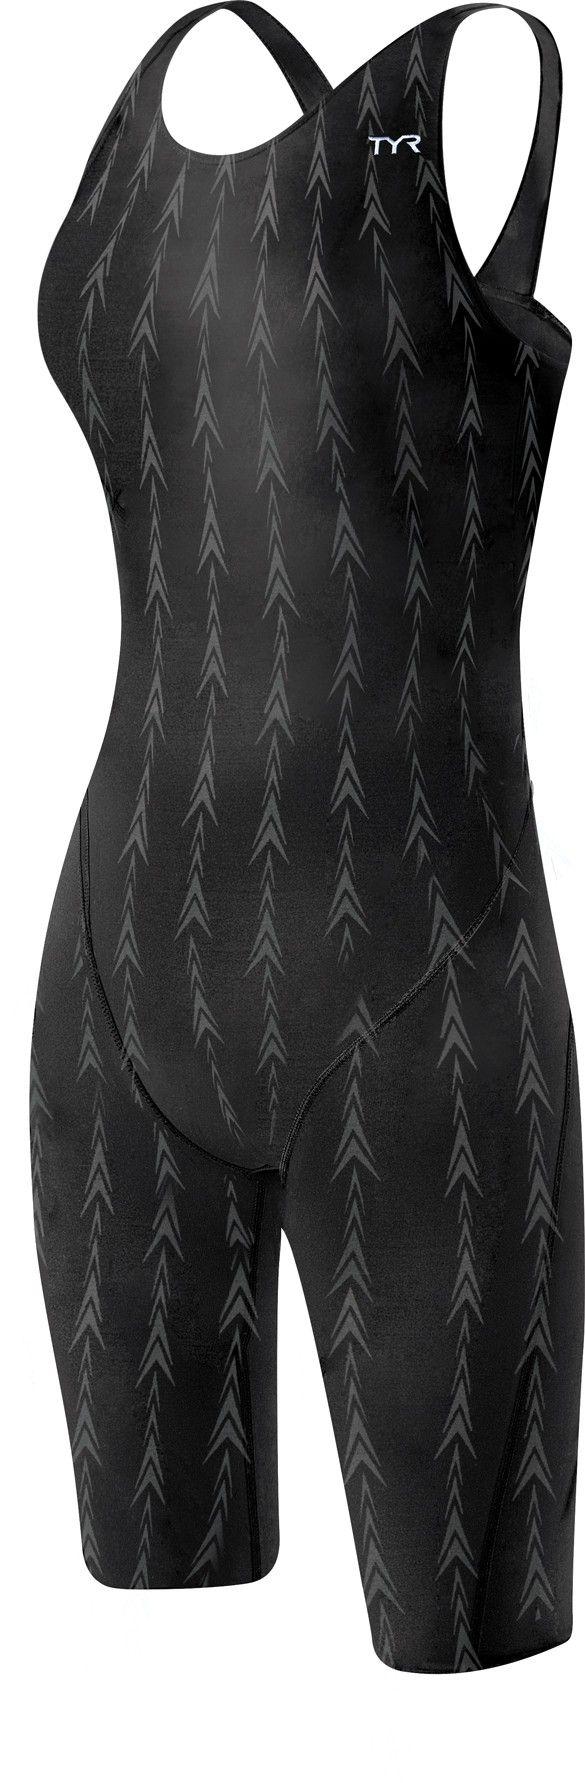 best swimwear images on pinterest swimming suits womenus